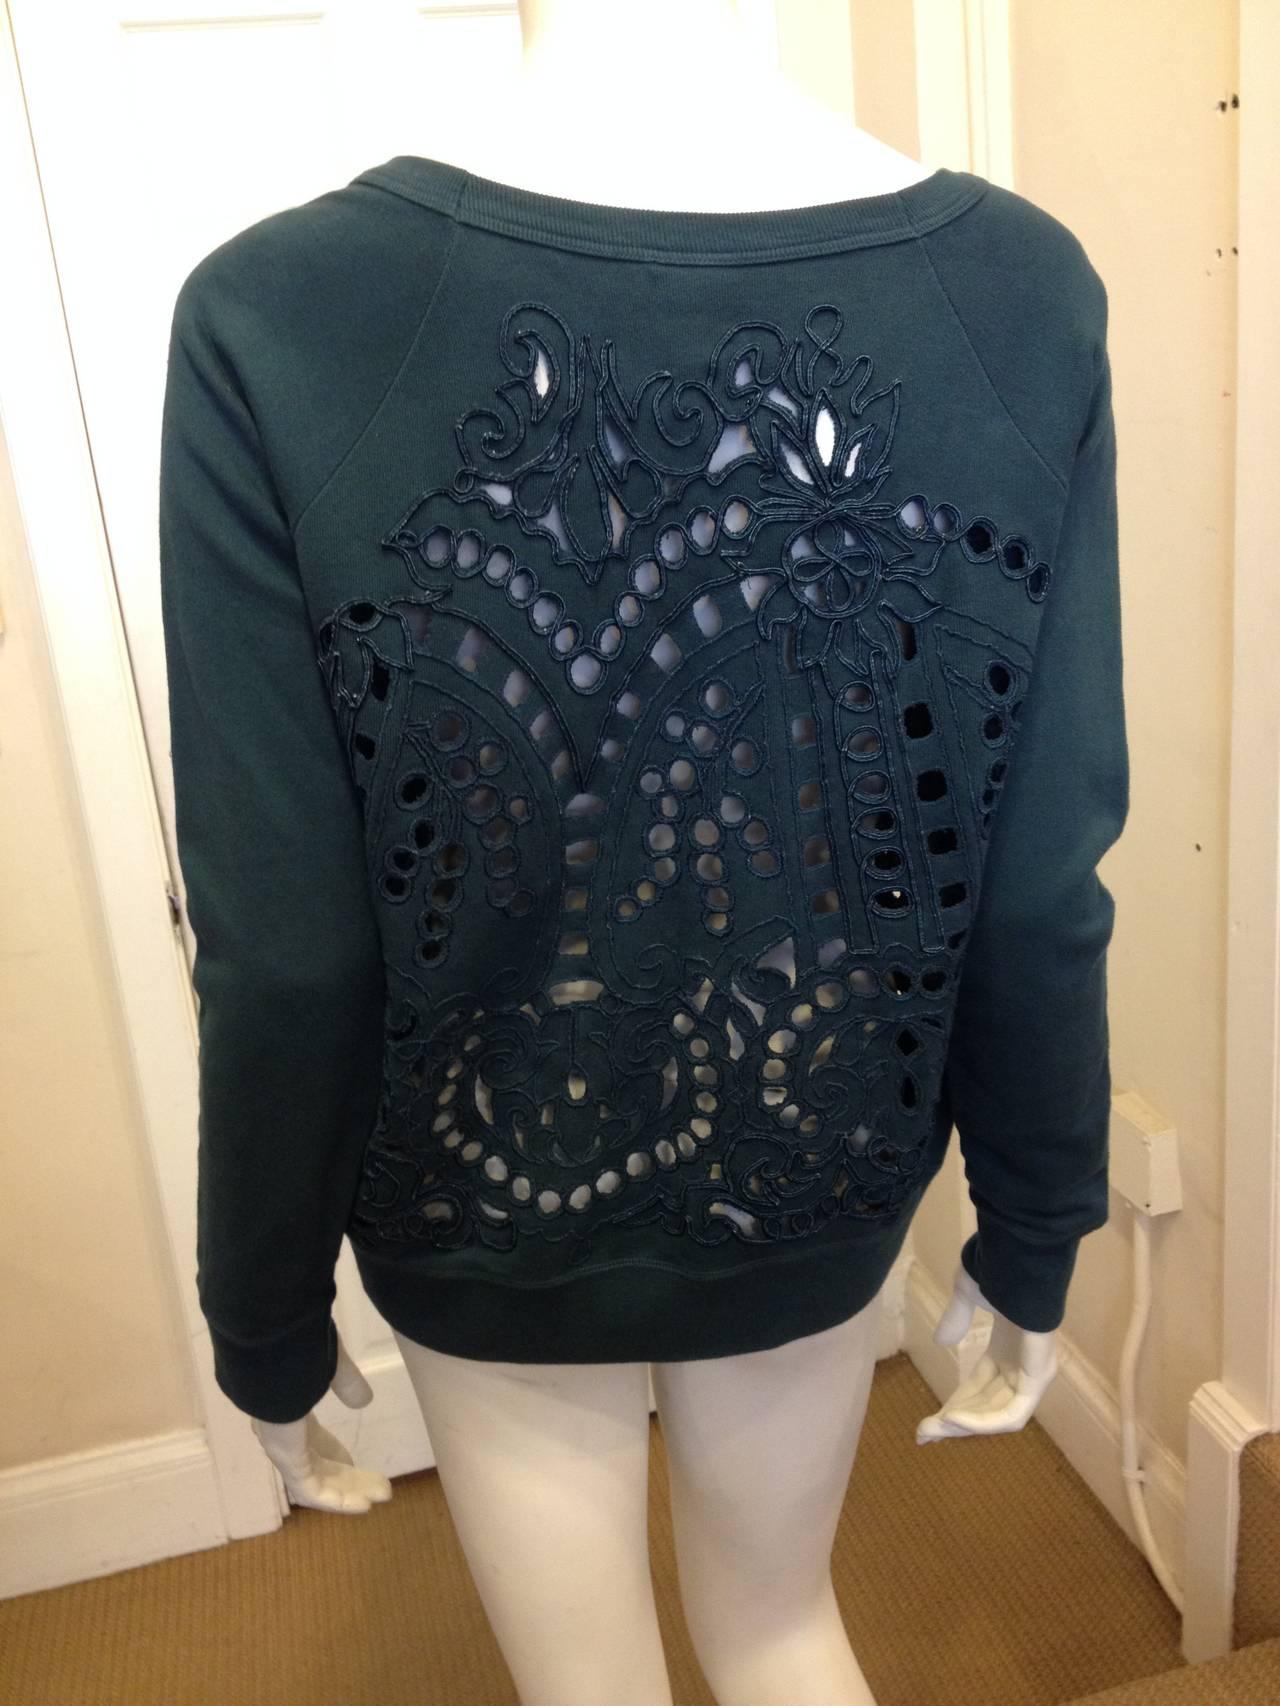 Dries Van Noten Teal Green Cutout Embroidered Sweatshirt 5